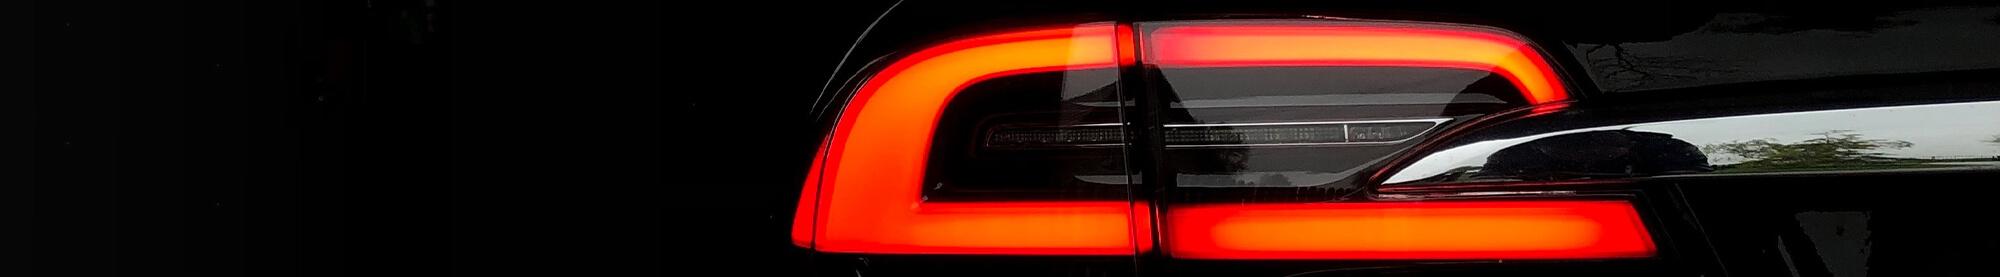 Tesla Model X Taillight